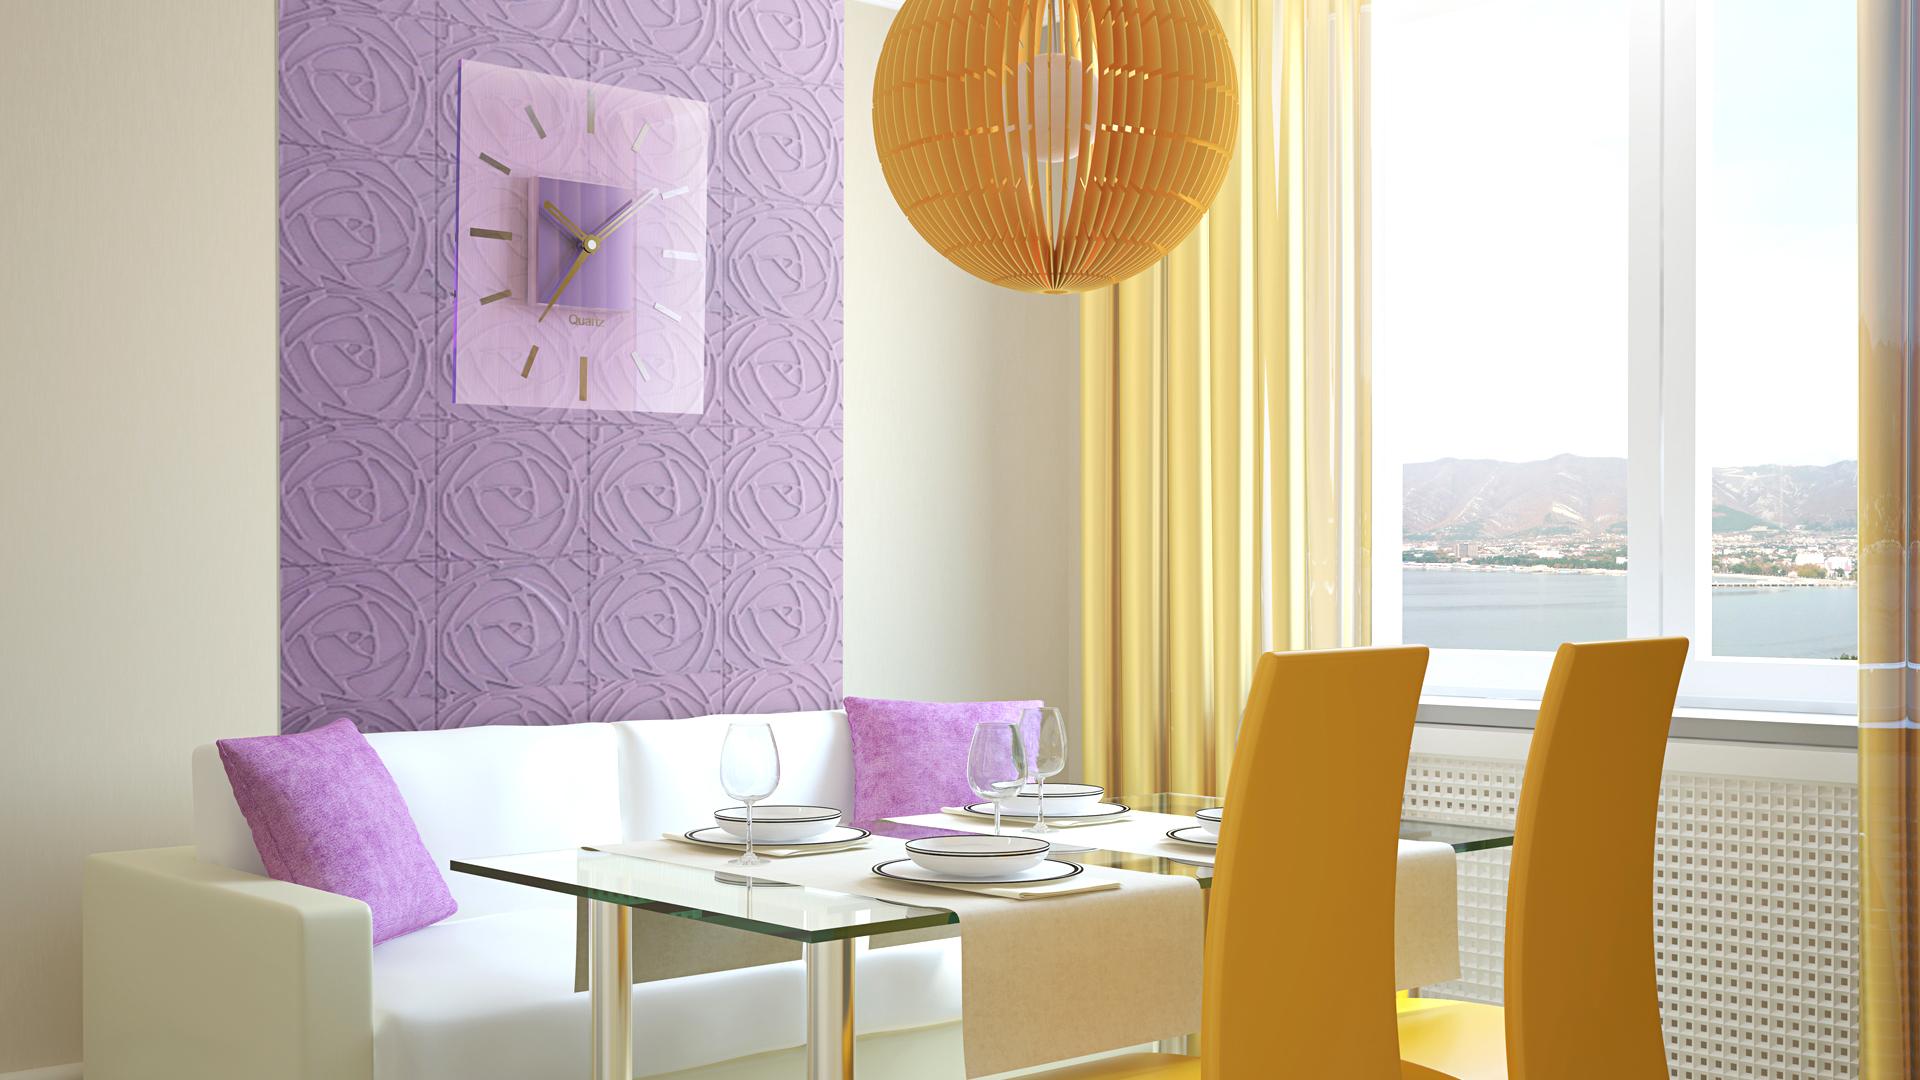 3D Wandpaneele - Produkte - Peony - Deckenpaneele - 3D Tapeten - Wandverkleidung